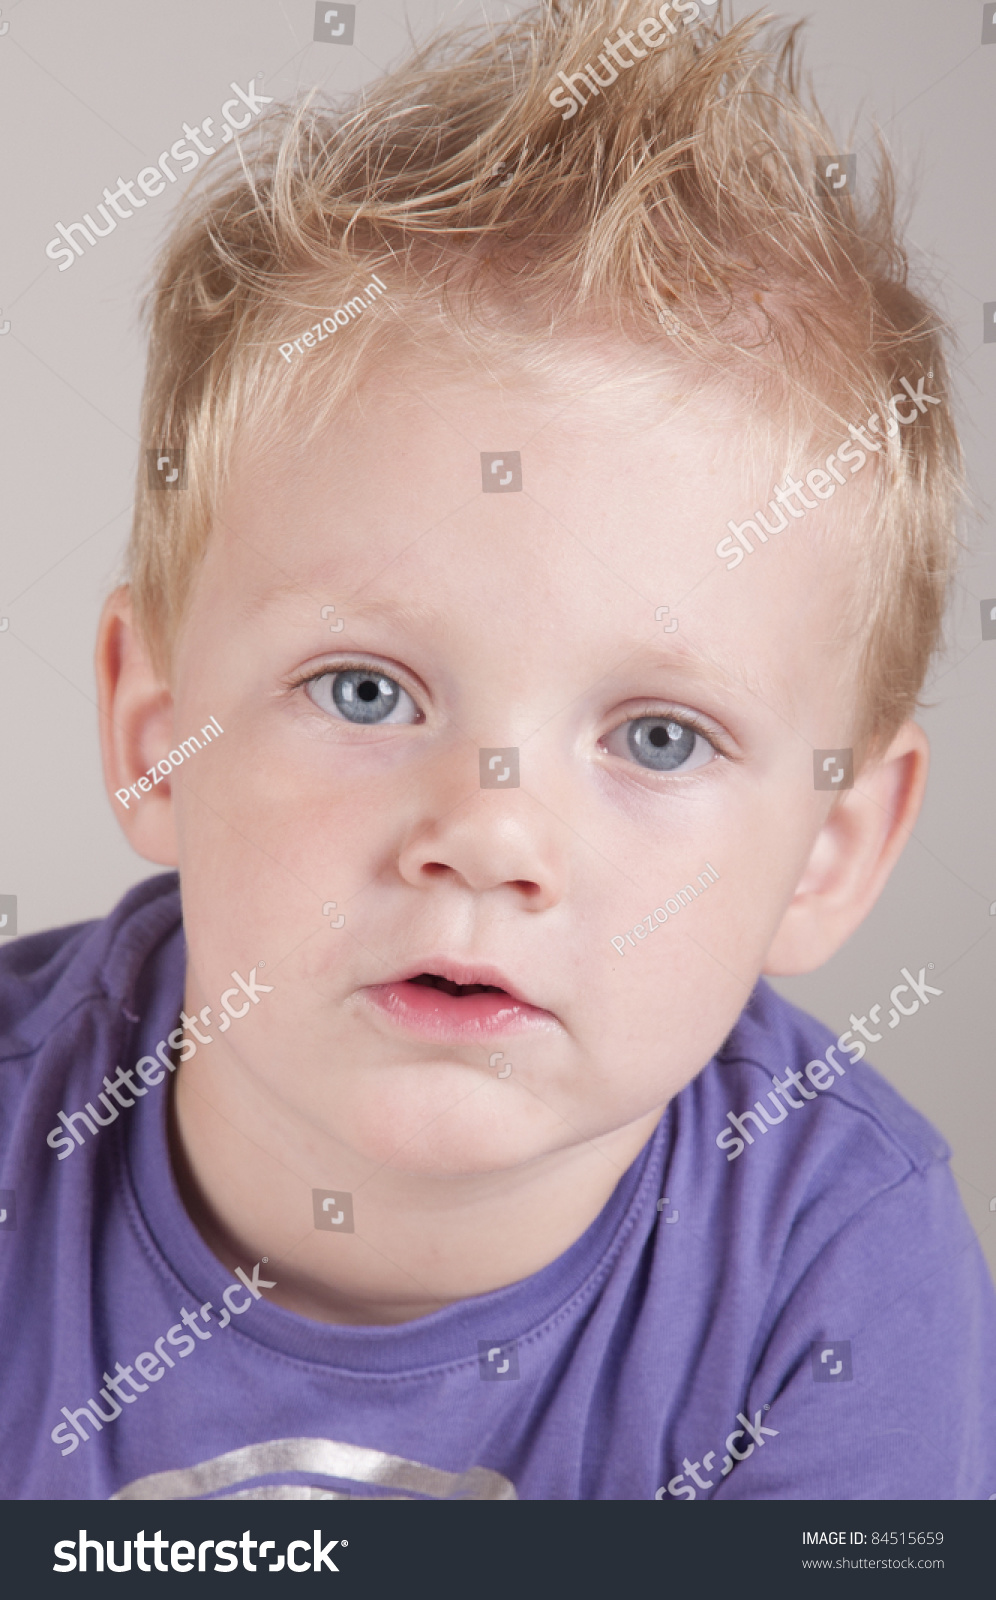 Cute Blue Eyes Boy Blonde Hair Stock Photo 84515659 Shutterstock